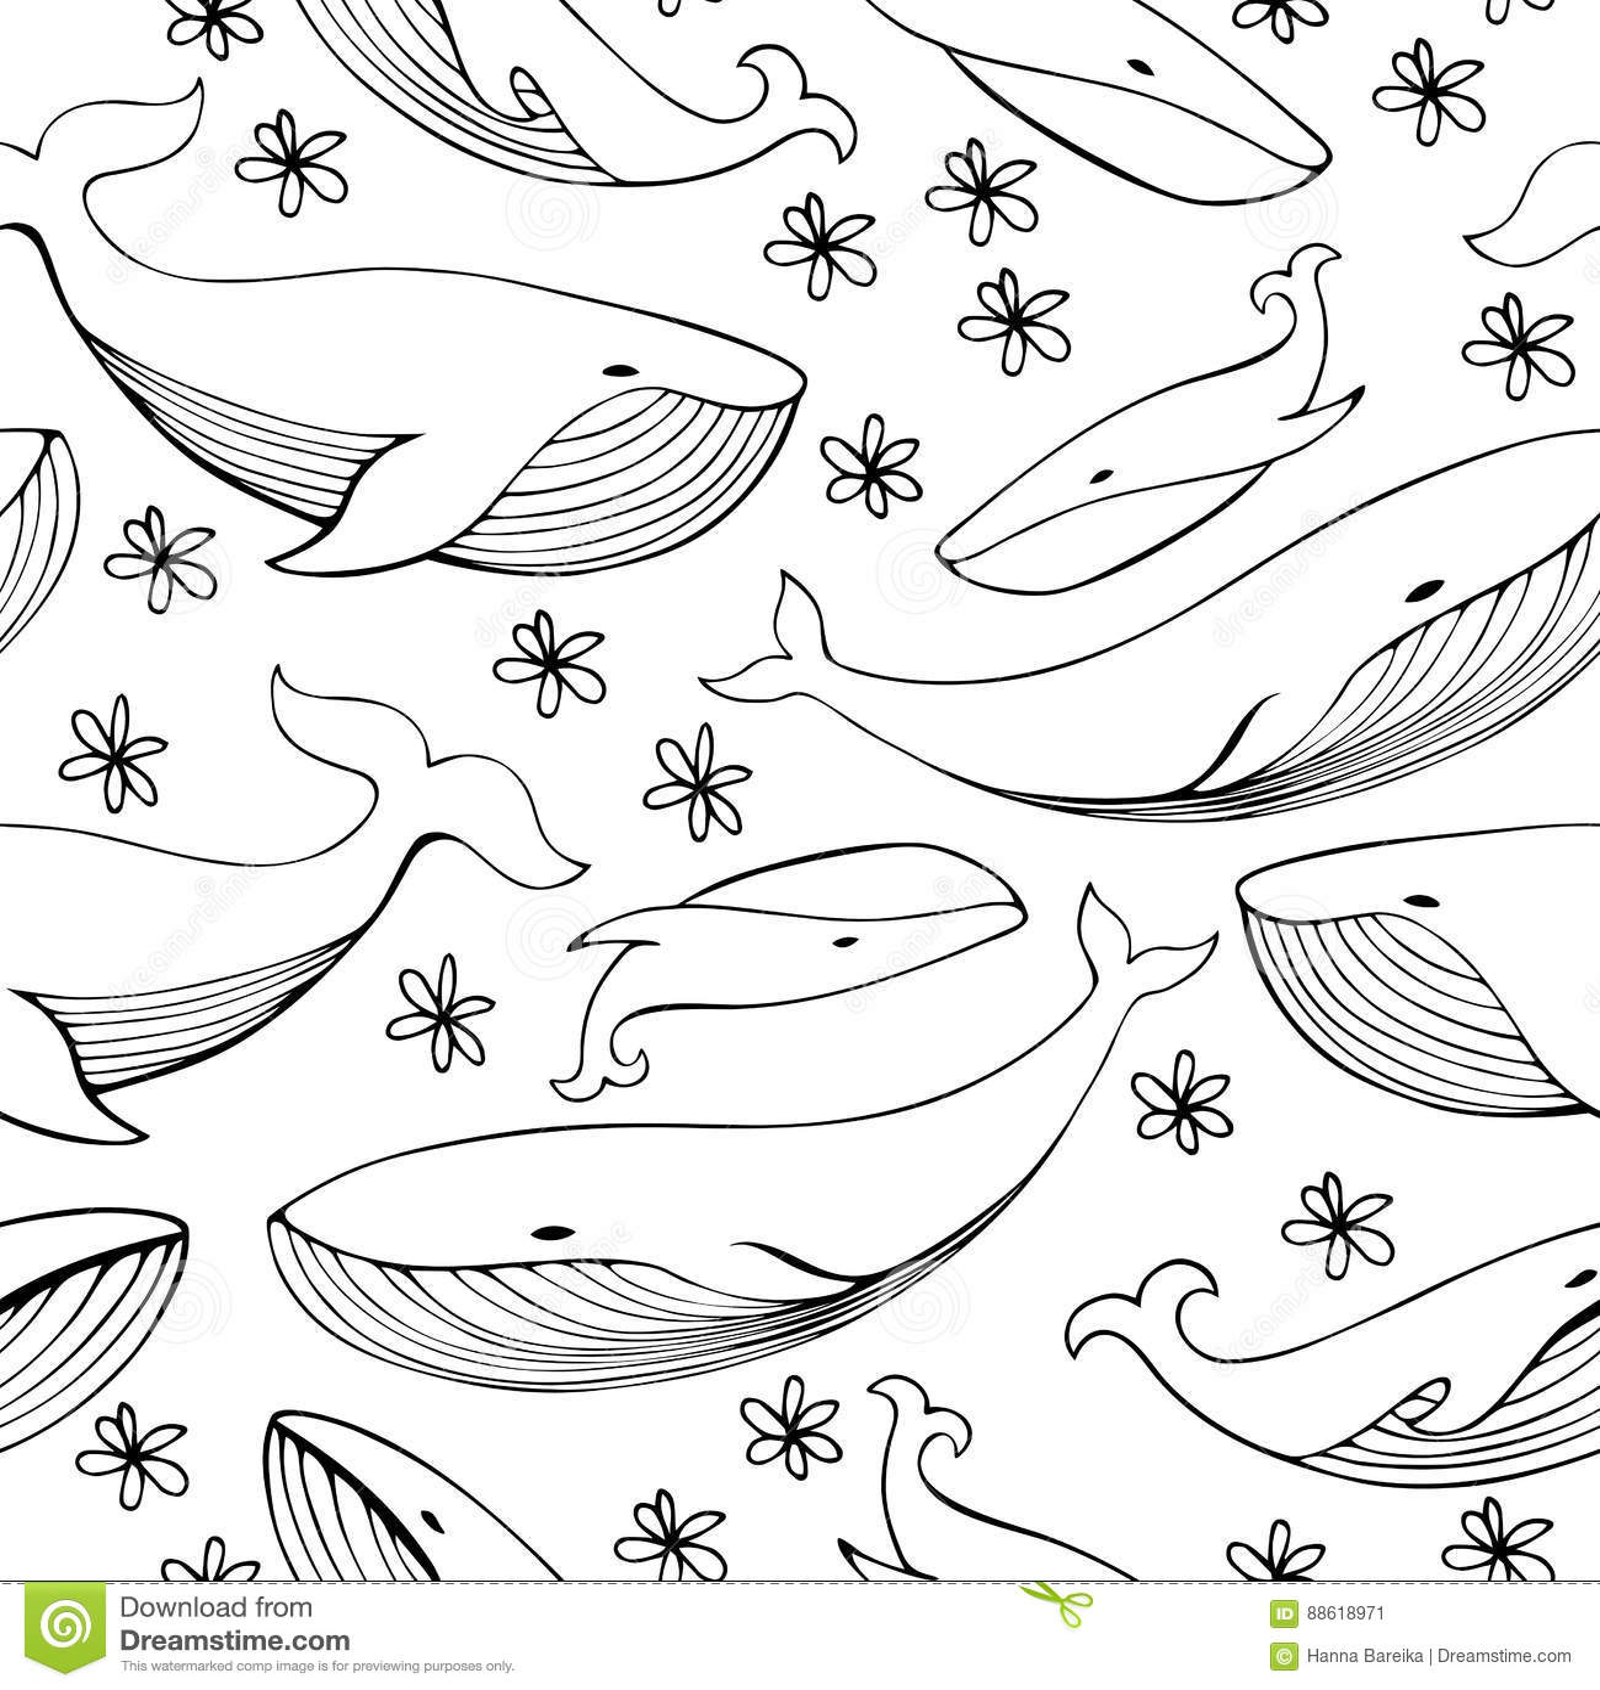 Cute hand drawn whales. Monochrome Vector seamless pattern.